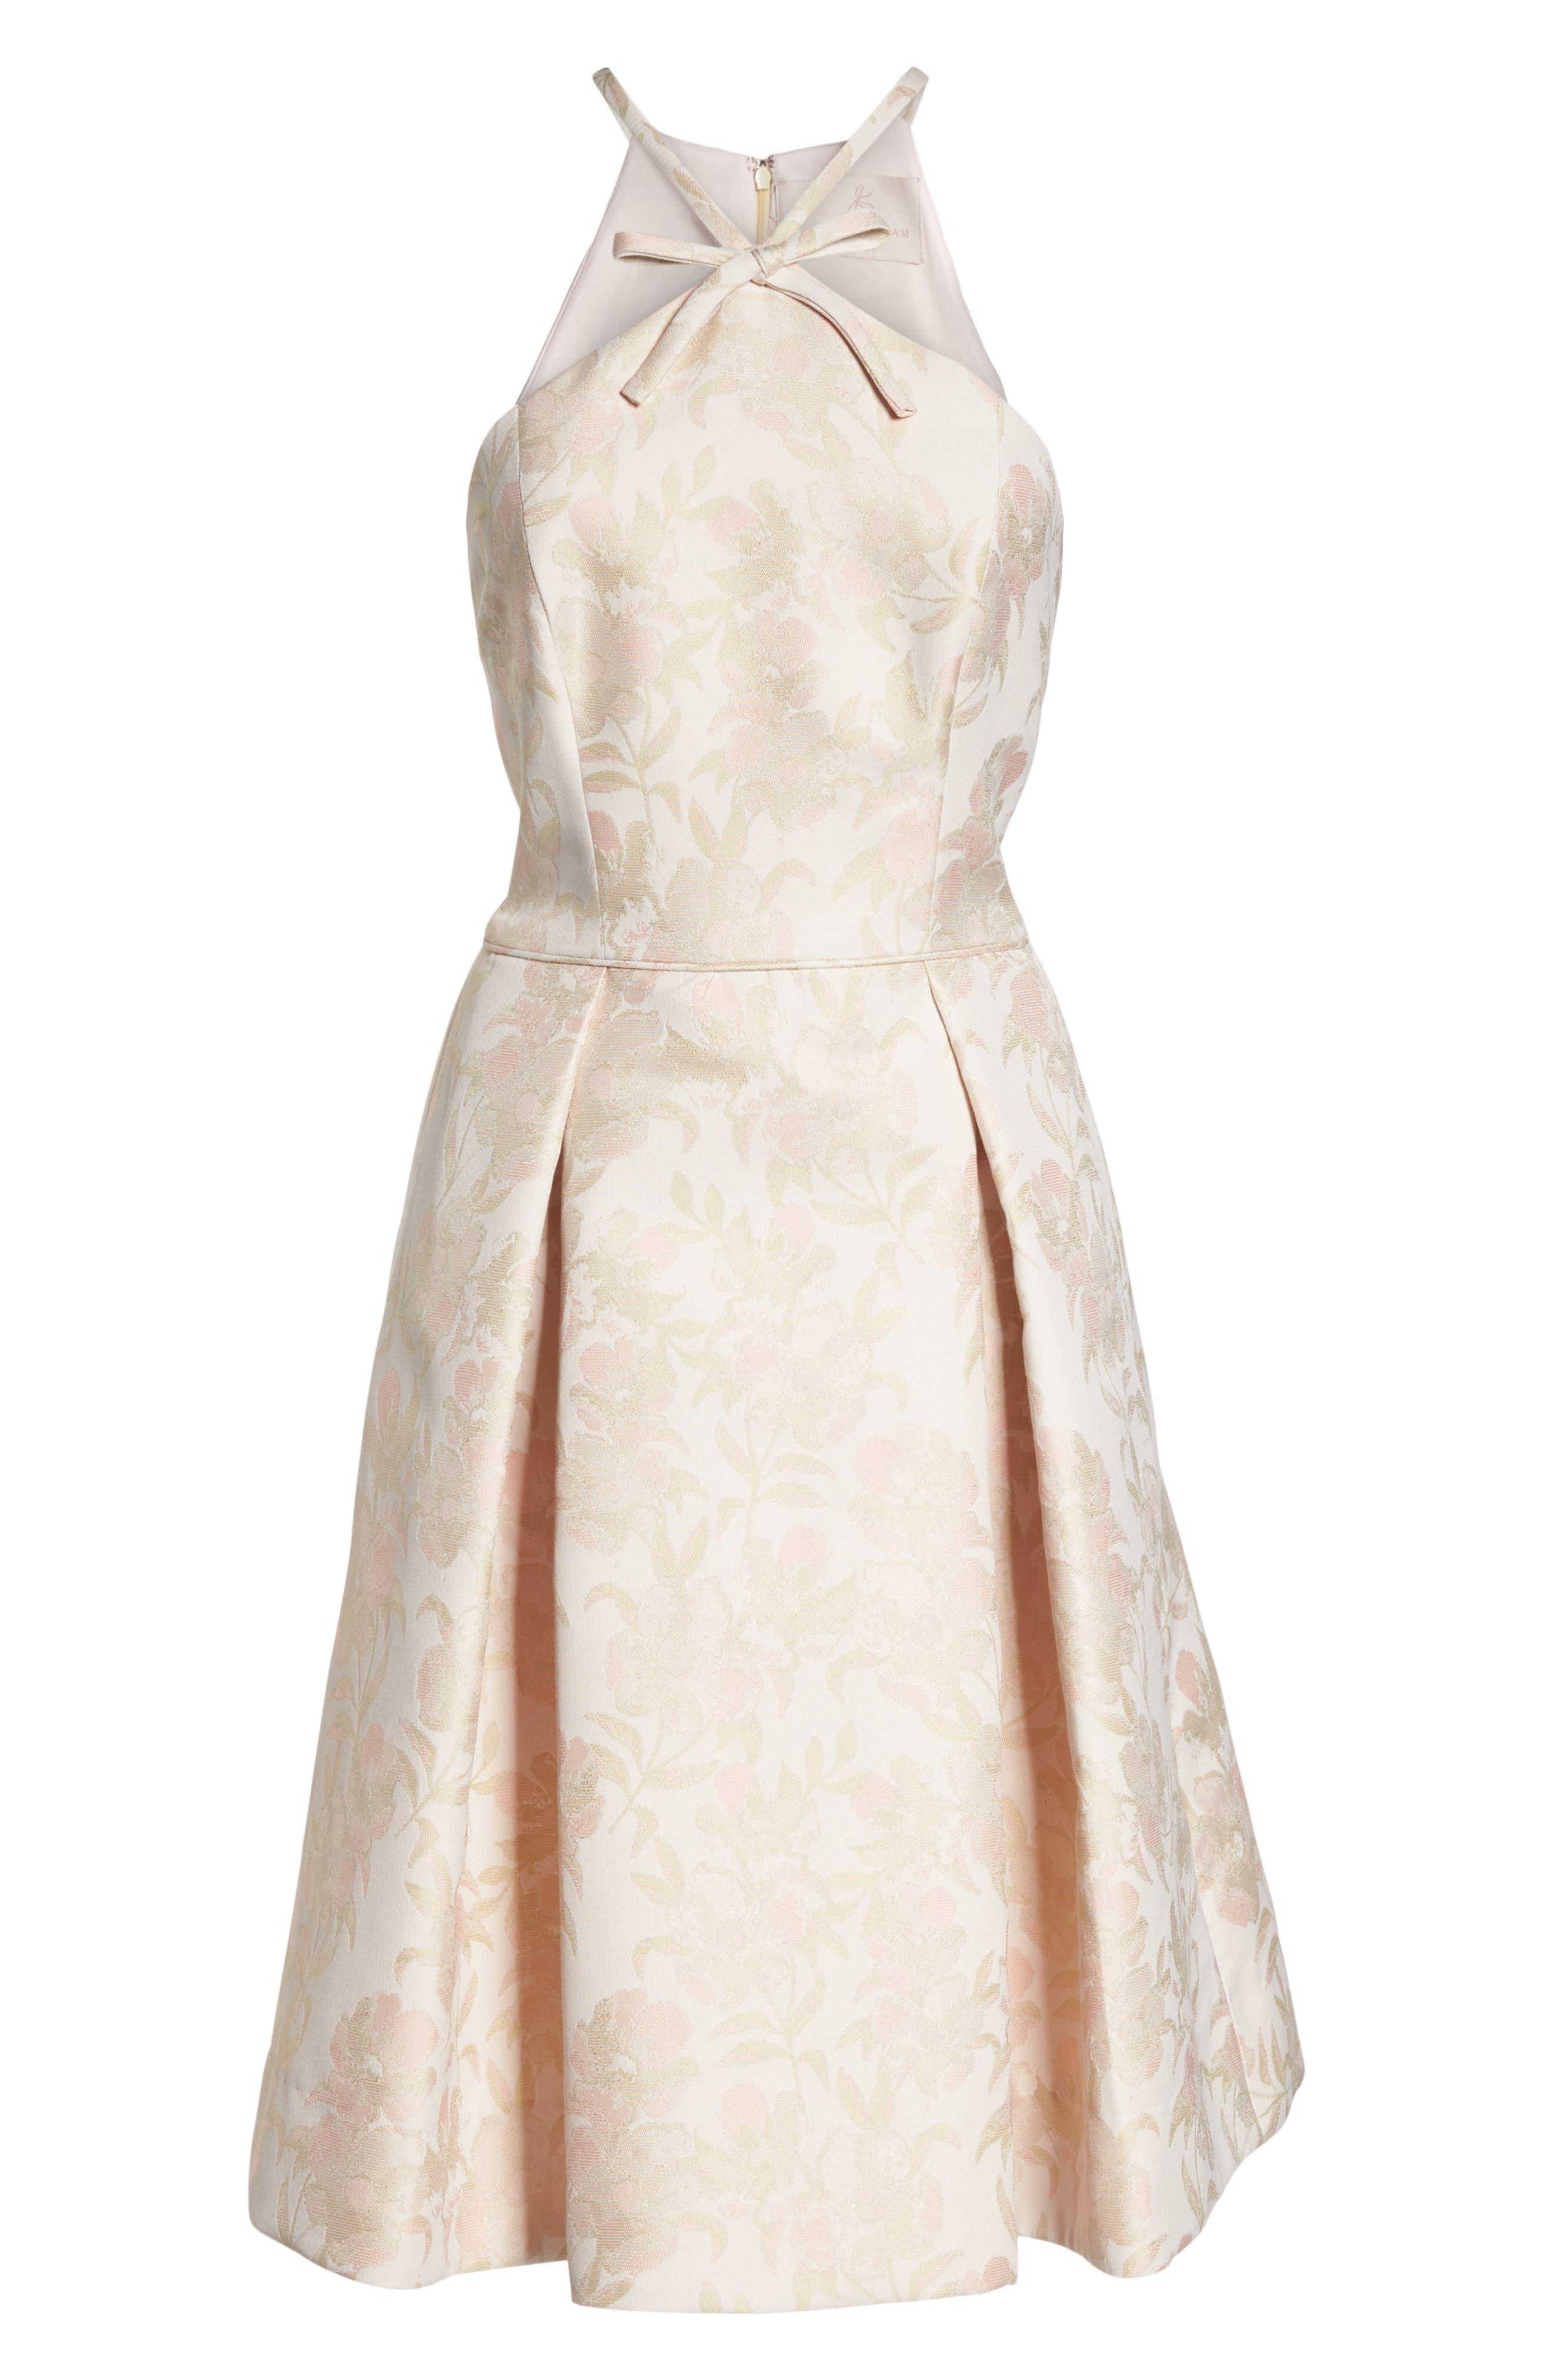 Evelyn Sea Holly Jacquard Halter Dress,                             Alternate thumbnail 8, color,                             Blush Combo